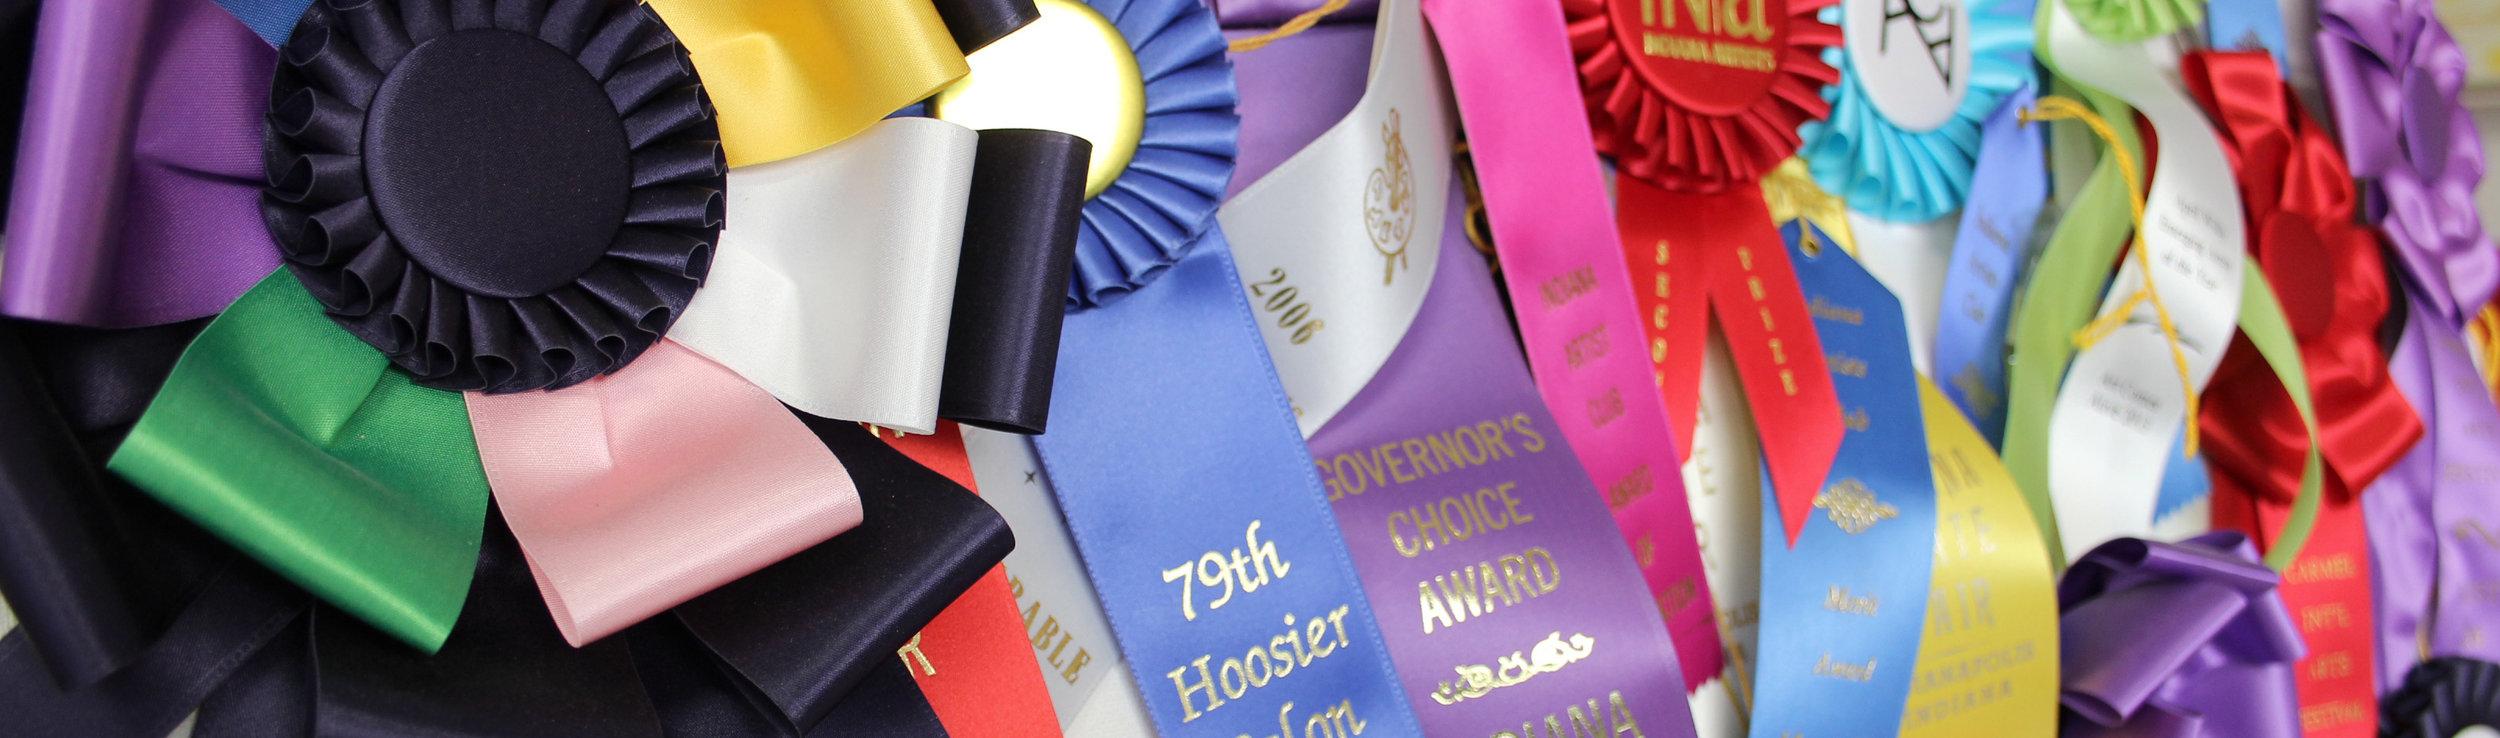 ribbons 2.jpg